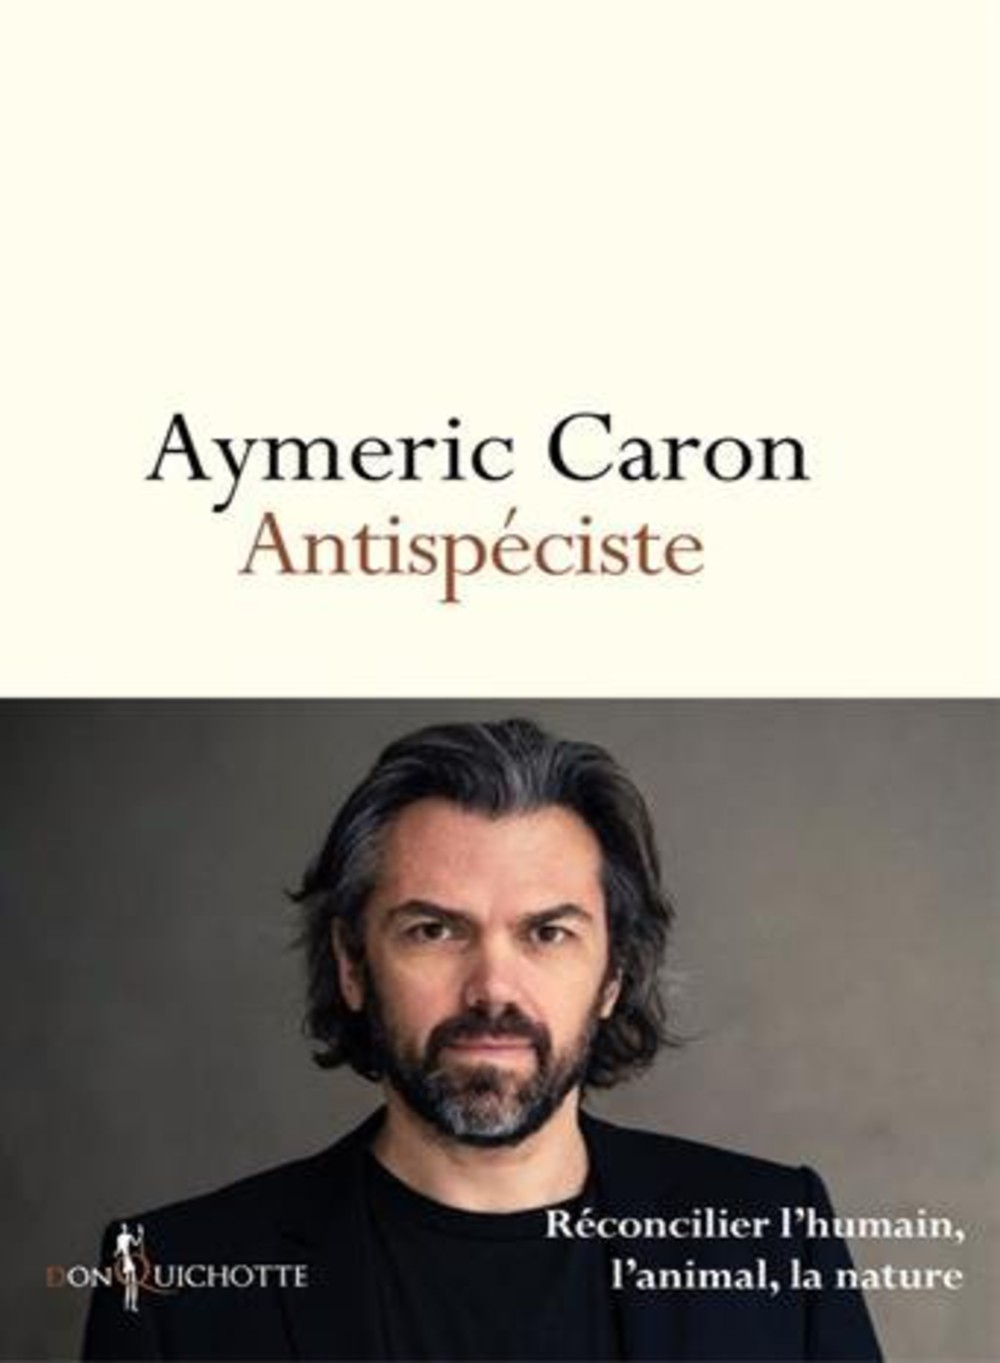 Antispéciste - Aymeric Caron 2016